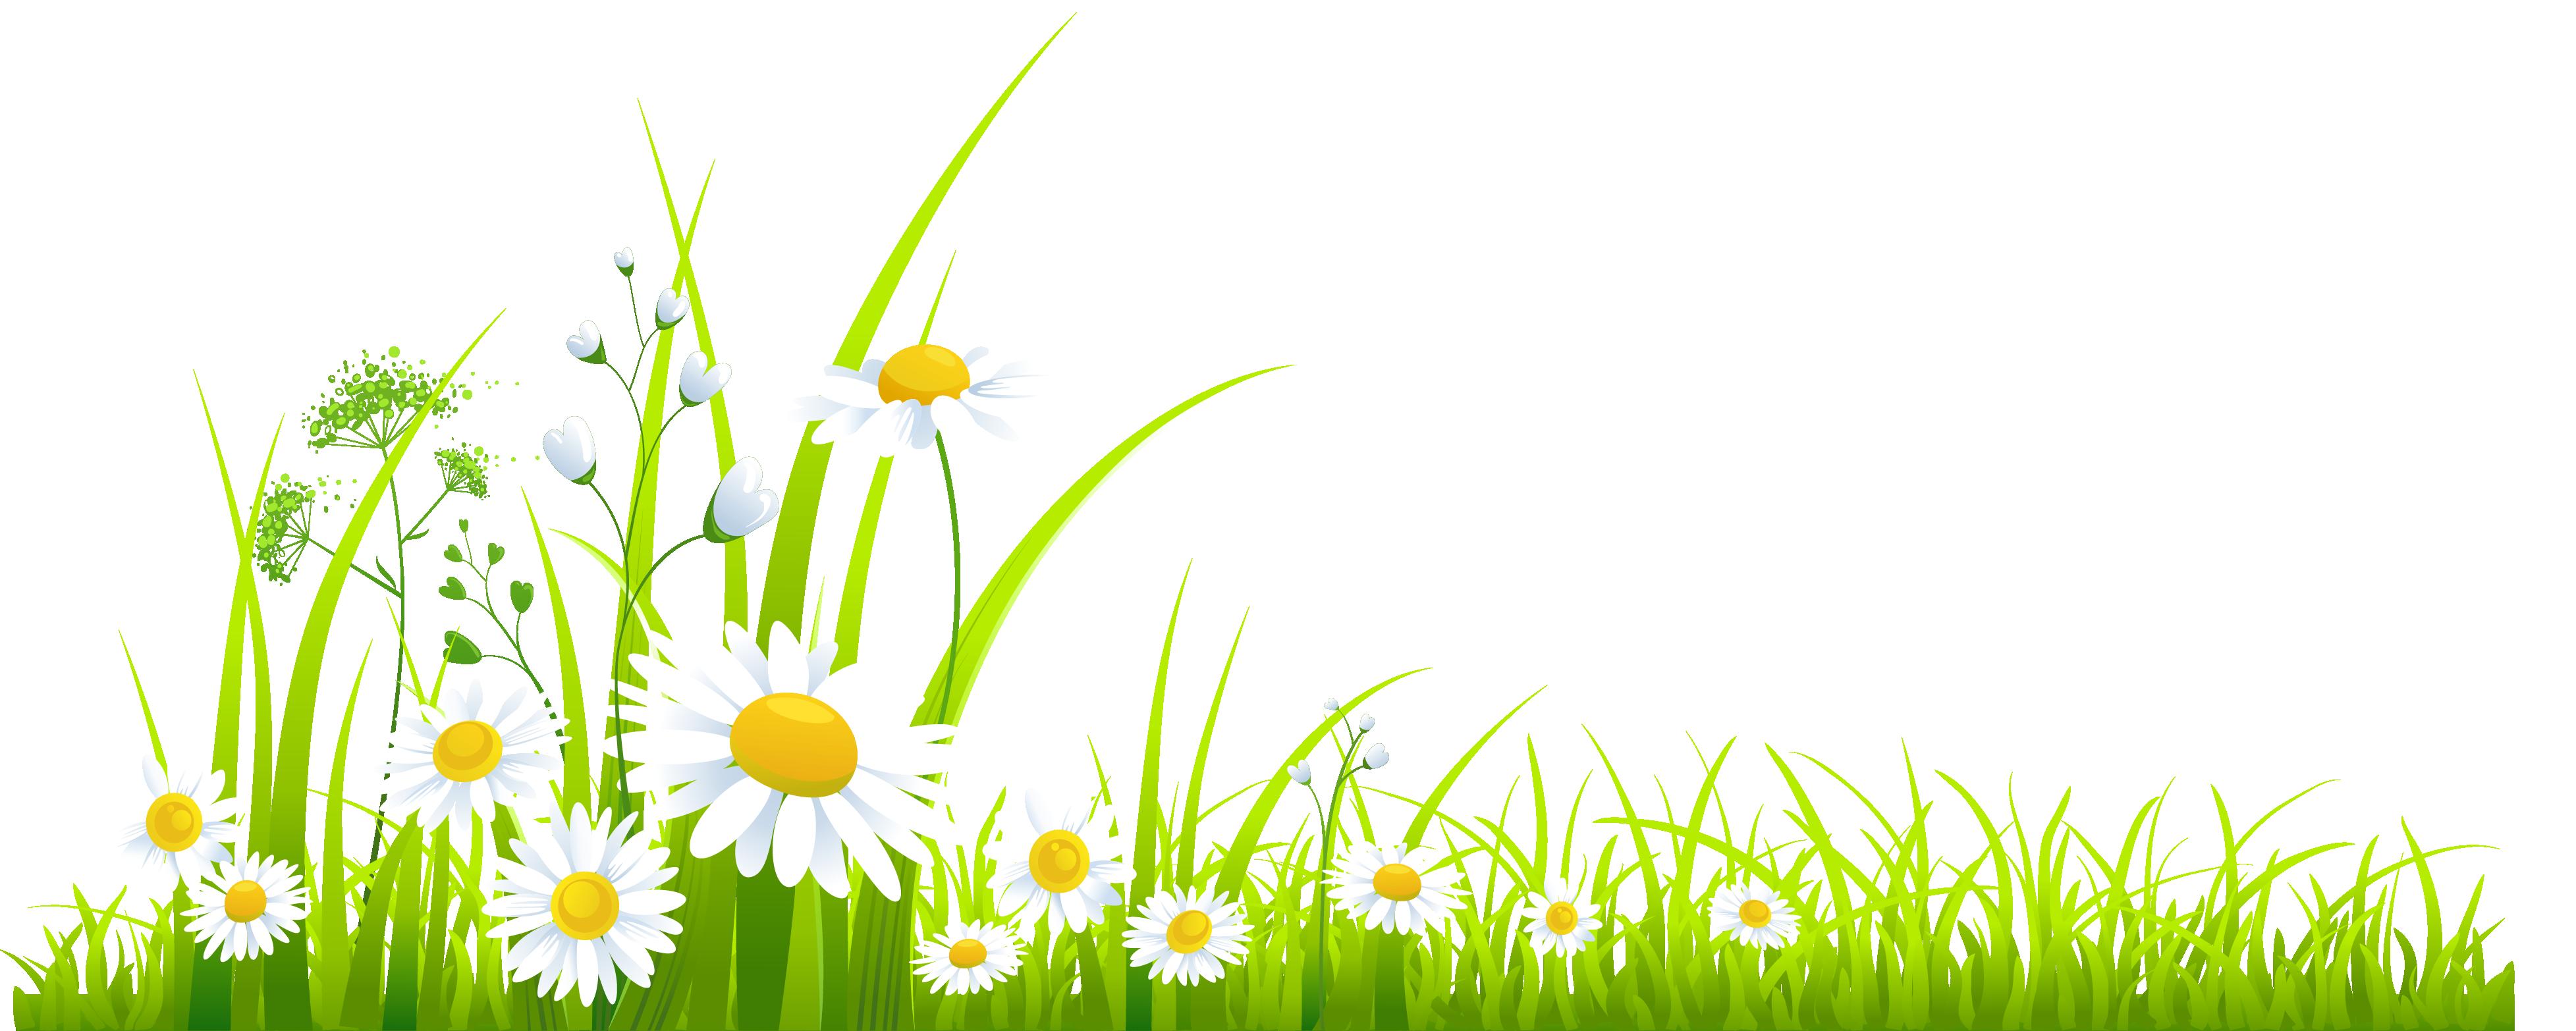 Spring Grass Clipart #1